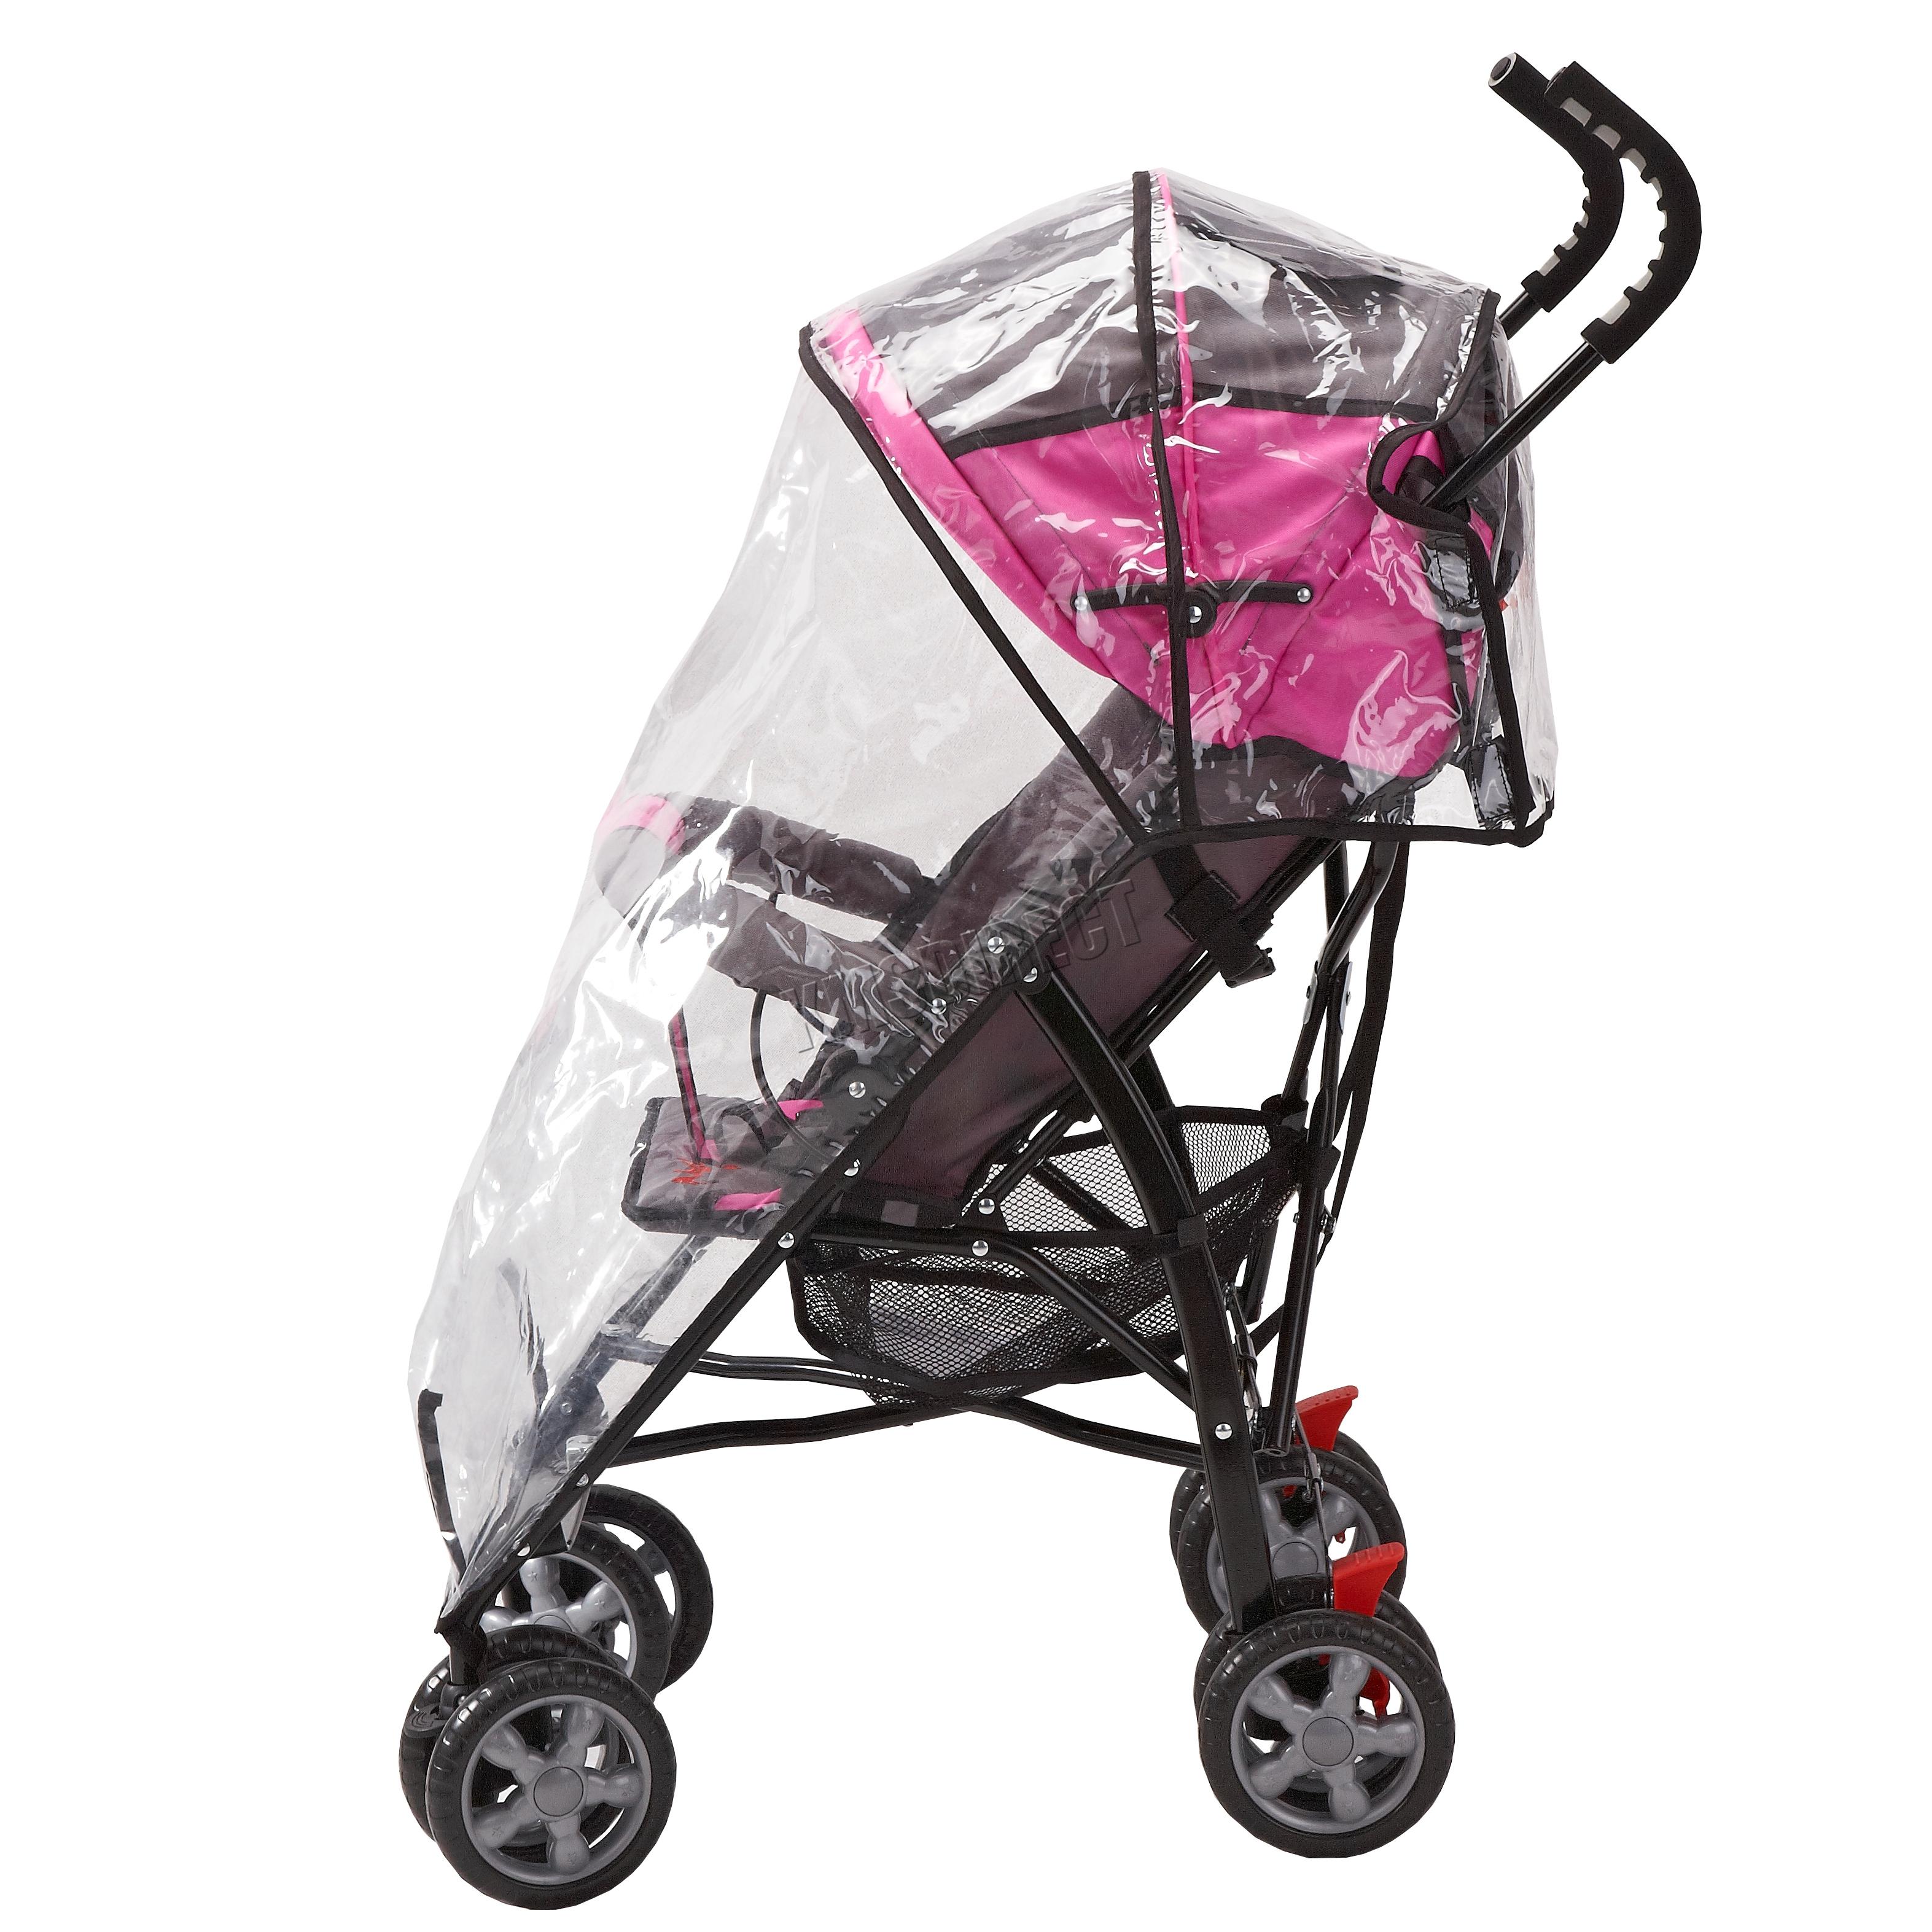 FoxHunter Baby Infant Toddler Single Stroller Pushchair ...